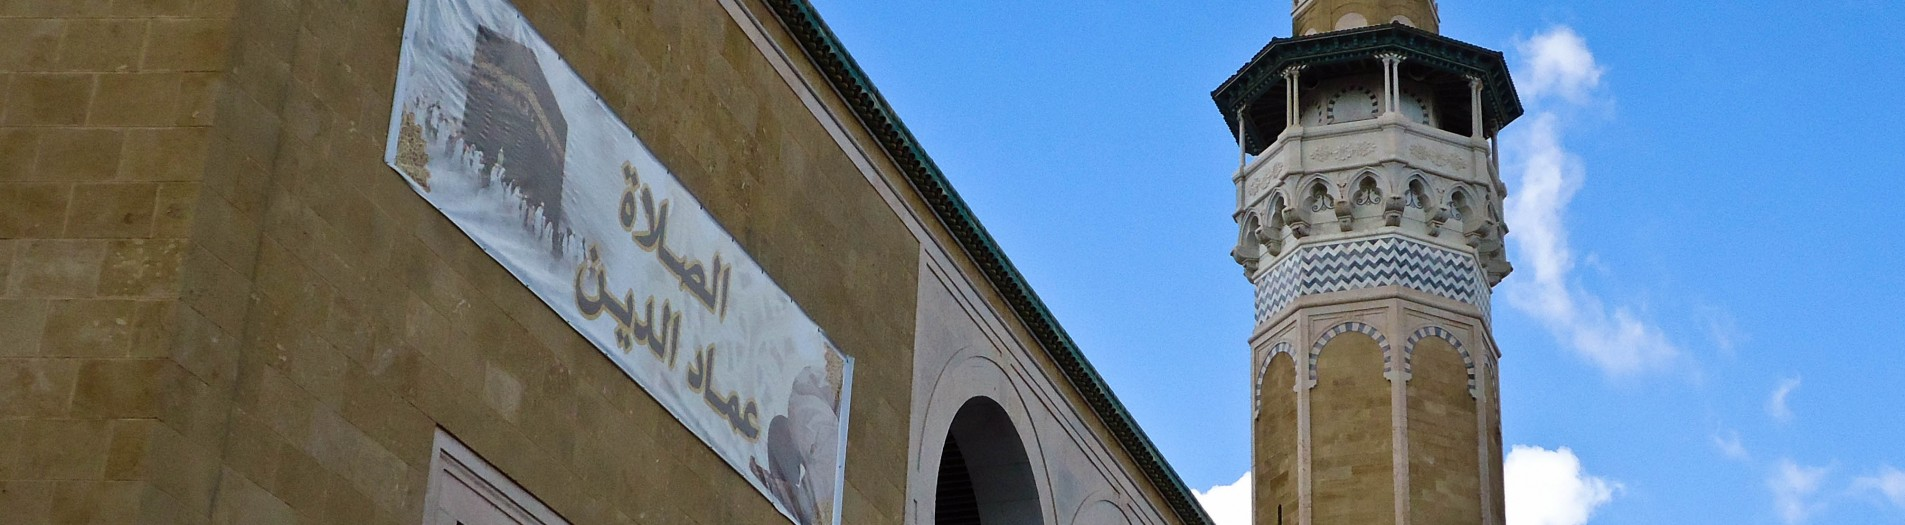 Mosquée Youssef Saheb Tabaa جامع يوسف صاحب الطابع